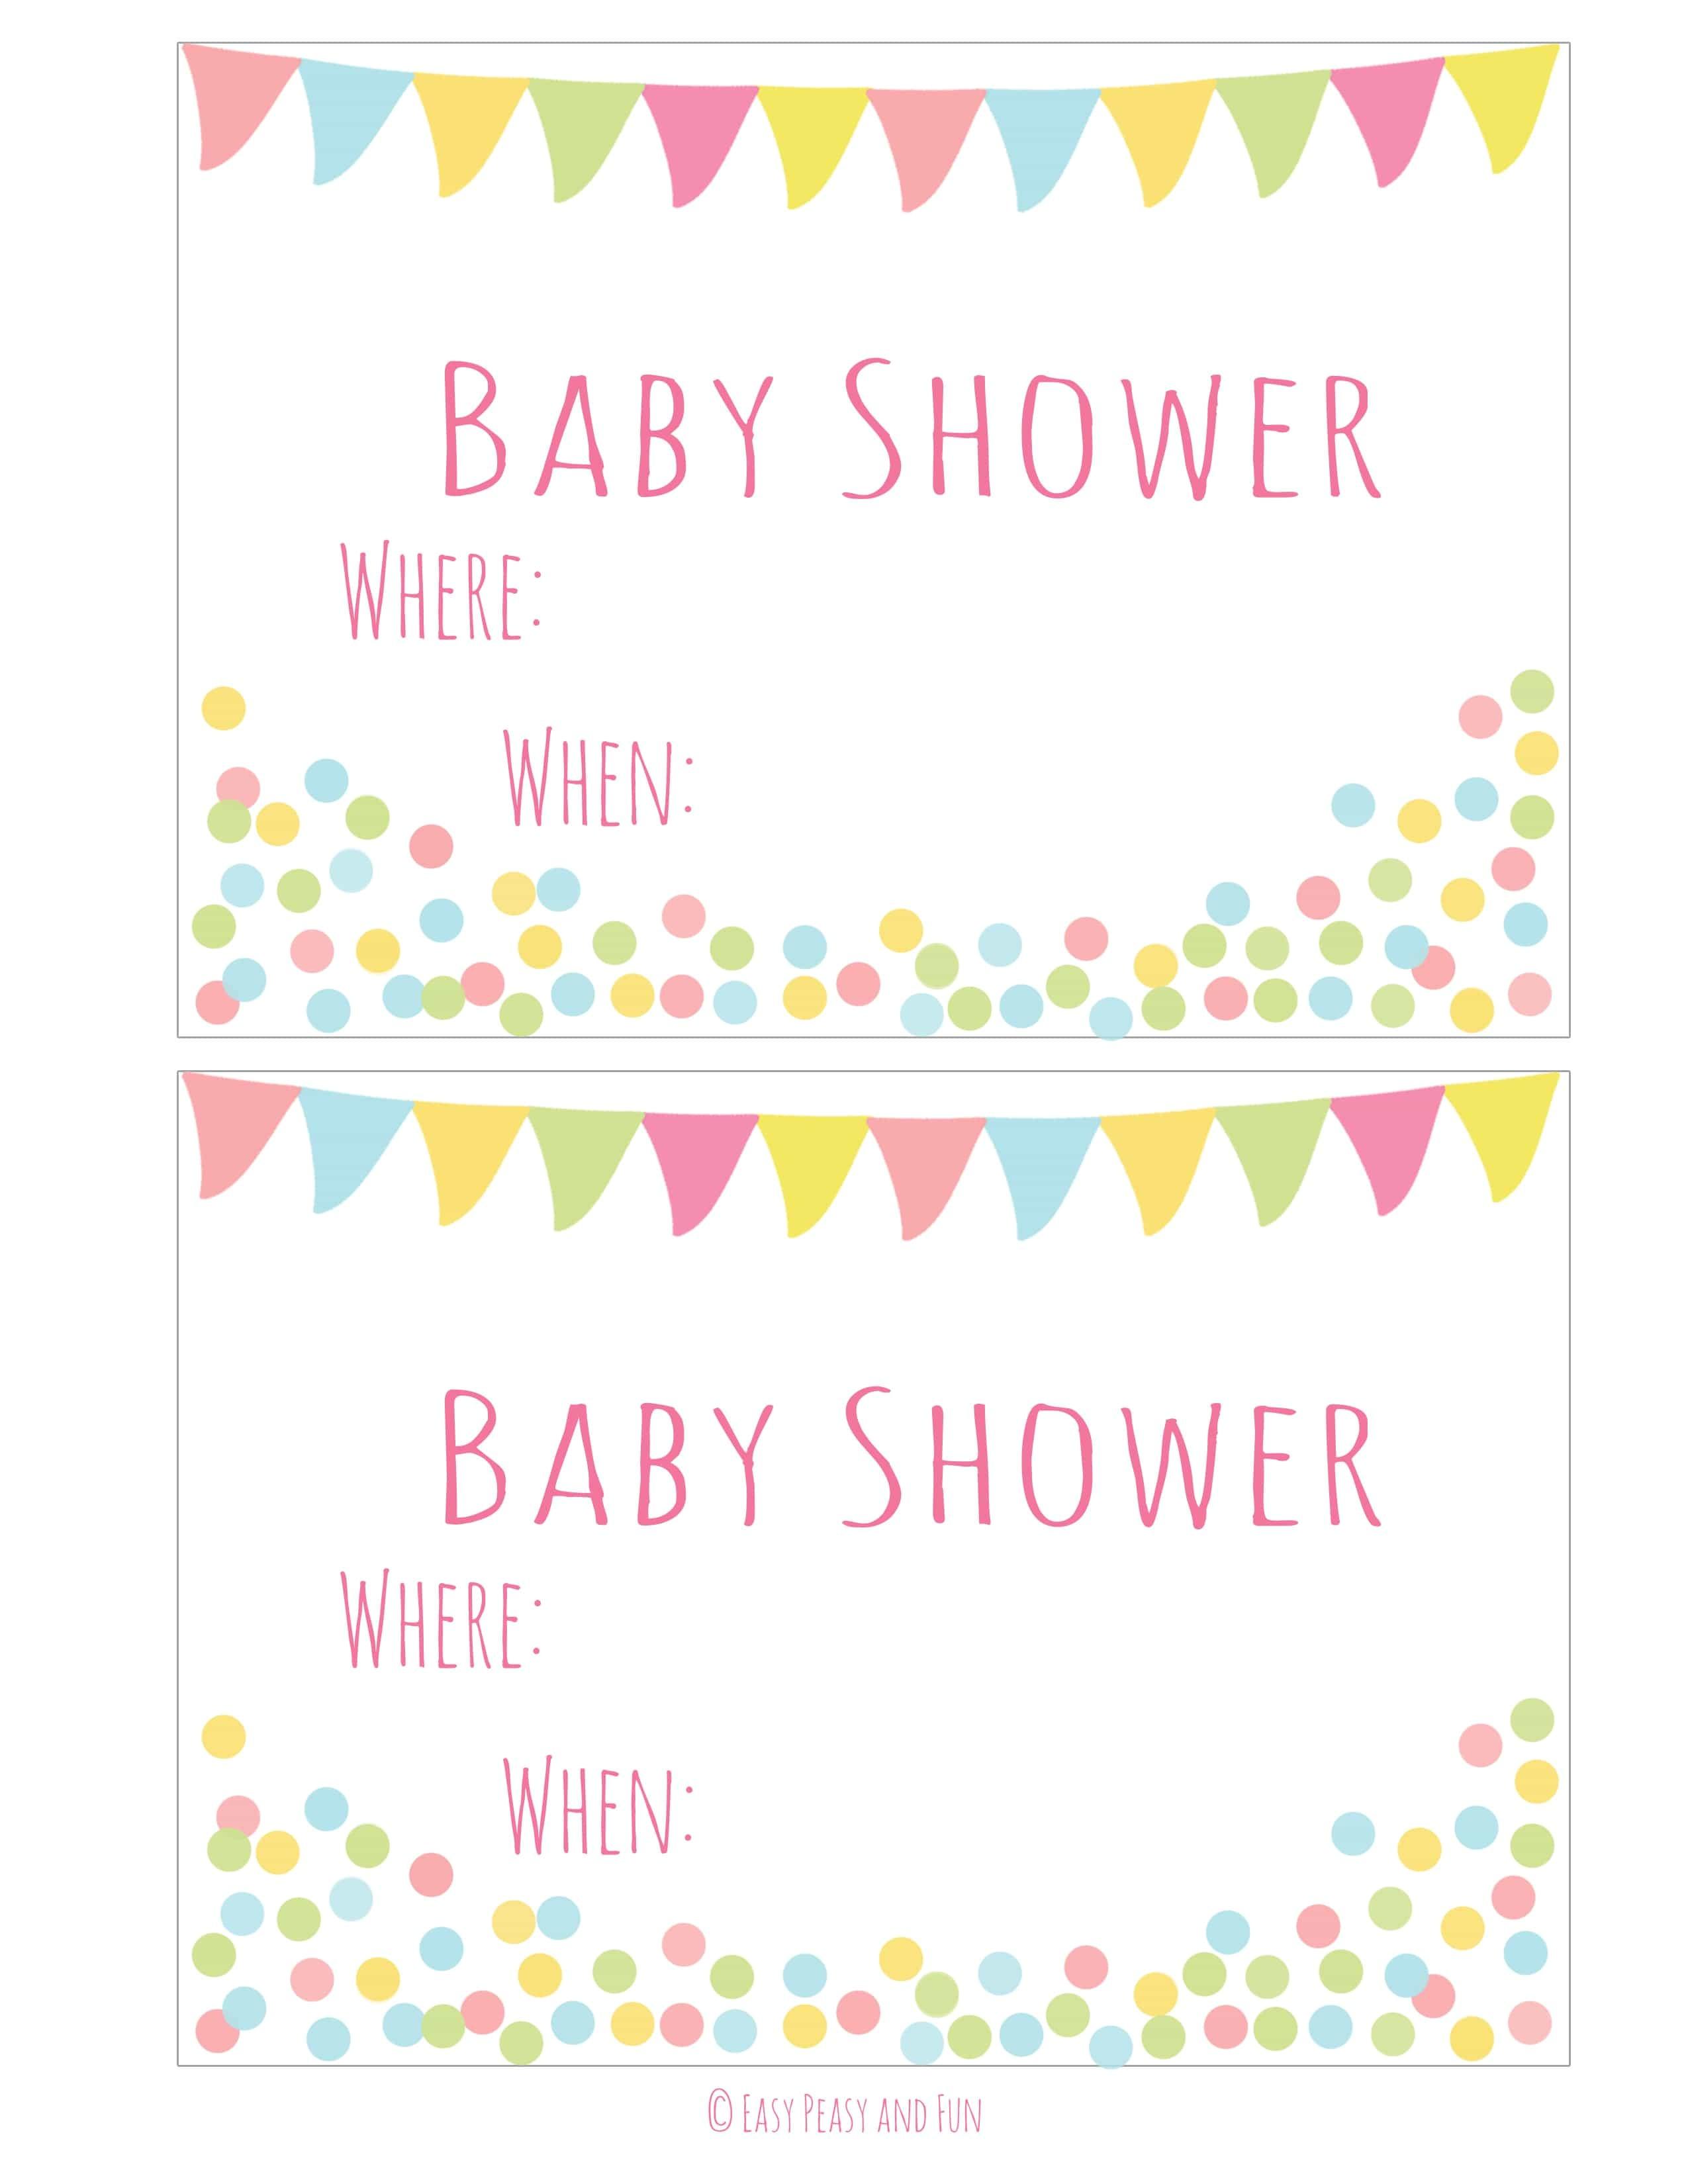 Free Printable Invitations Baby Shower Free Printable Baby Shower Invitation Easy Peasy and Fun